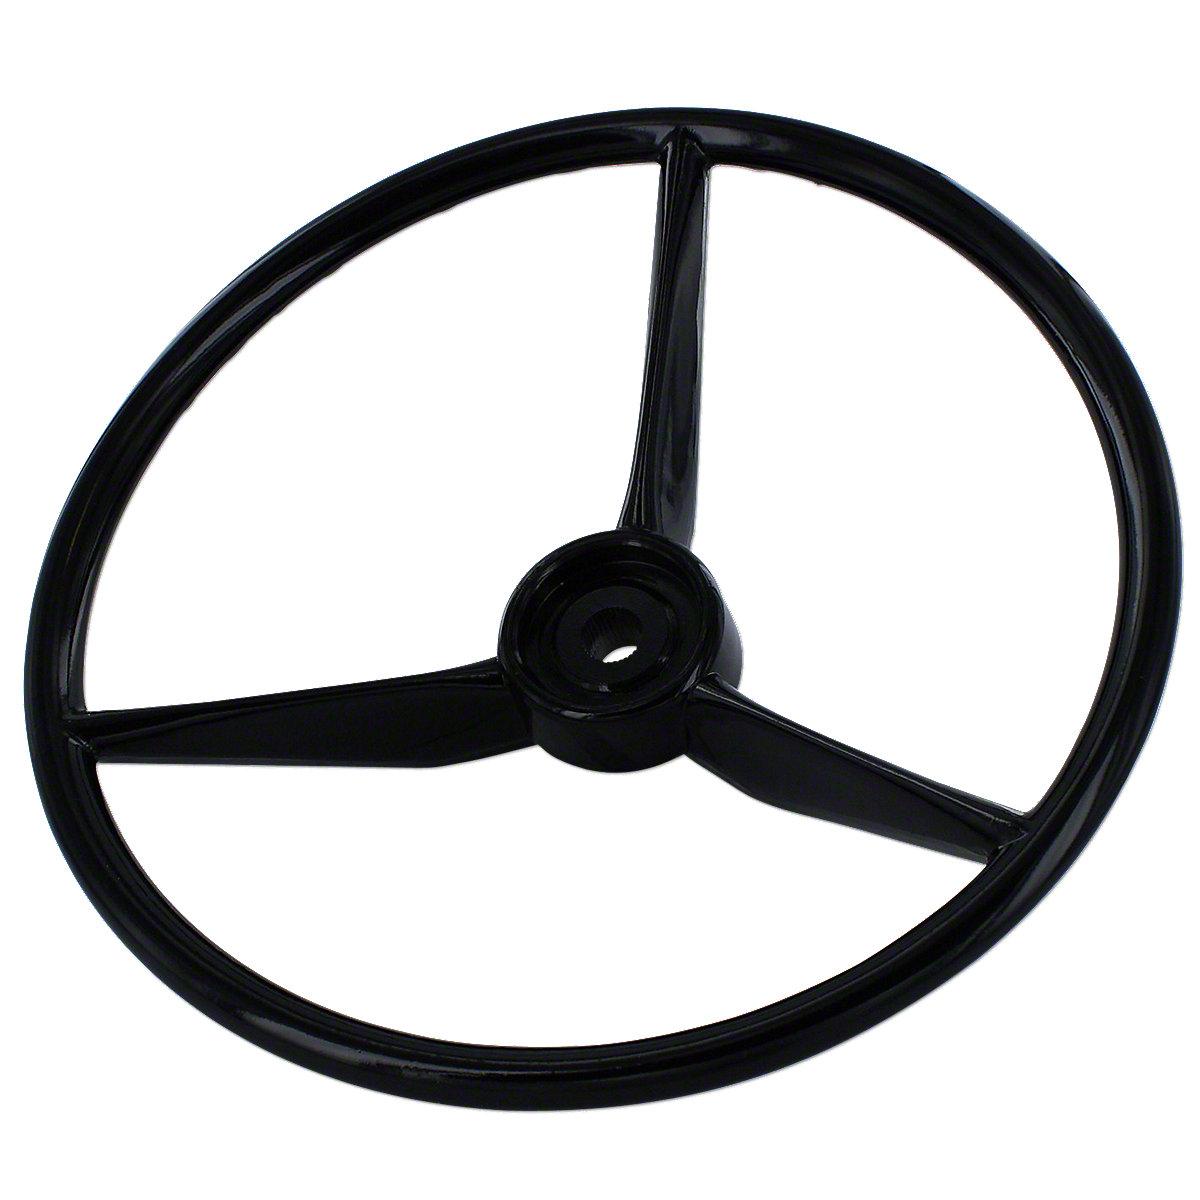 15 3 Spoke Steering Wheel For Allis Chalmers: 6060, 6070, 6080, 7000, 7010, 7020, 7045, 7060, 7580, 8010, 8030, 8050, 8070, 8550.